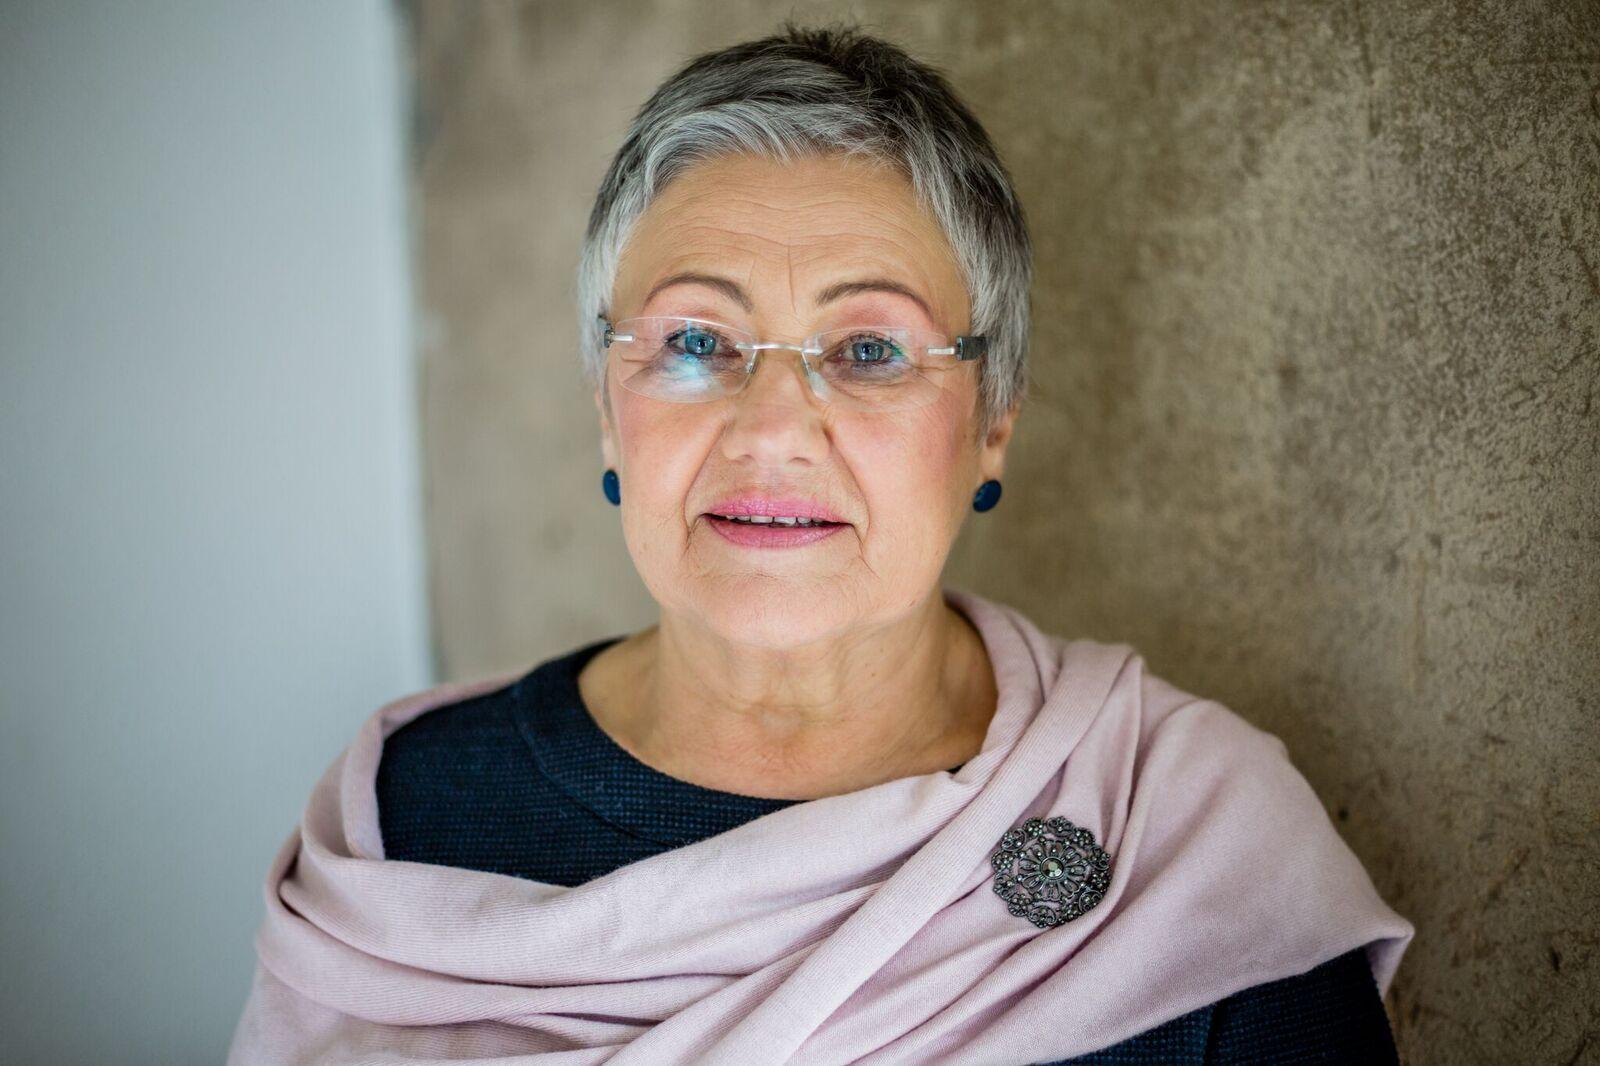 Anita Ziegler